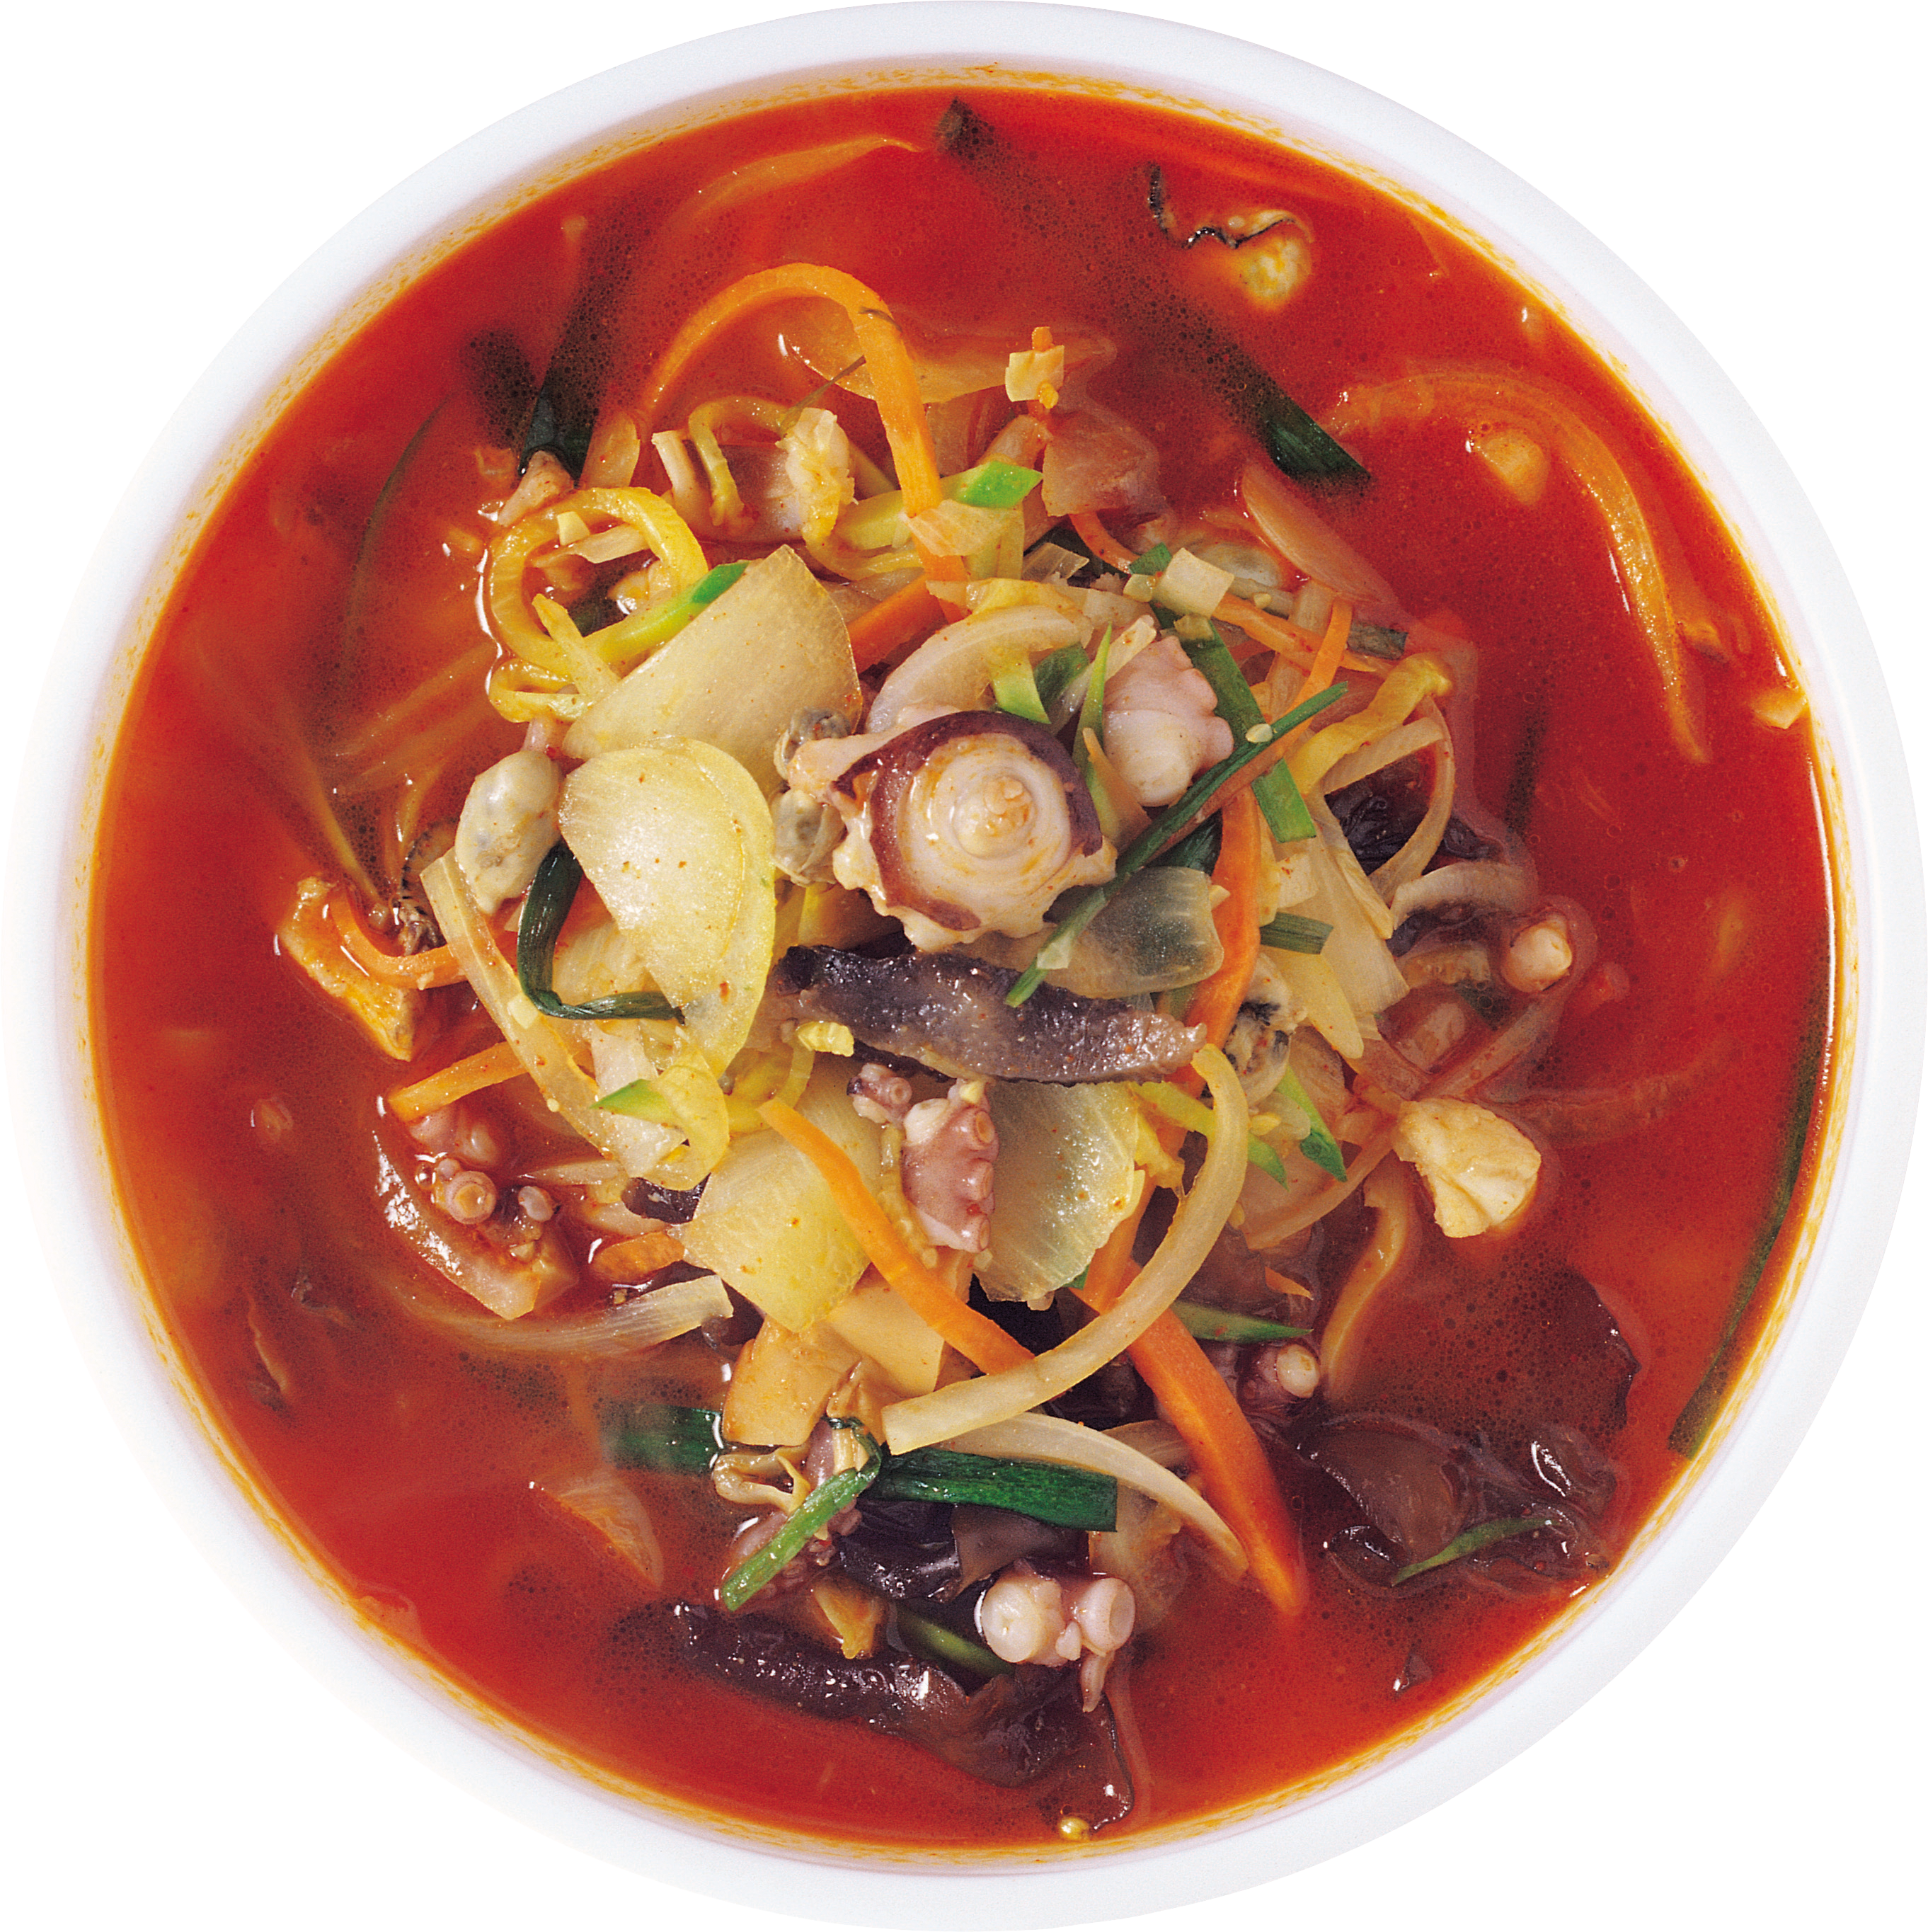 Png images free donwload. Soup clipart goulash